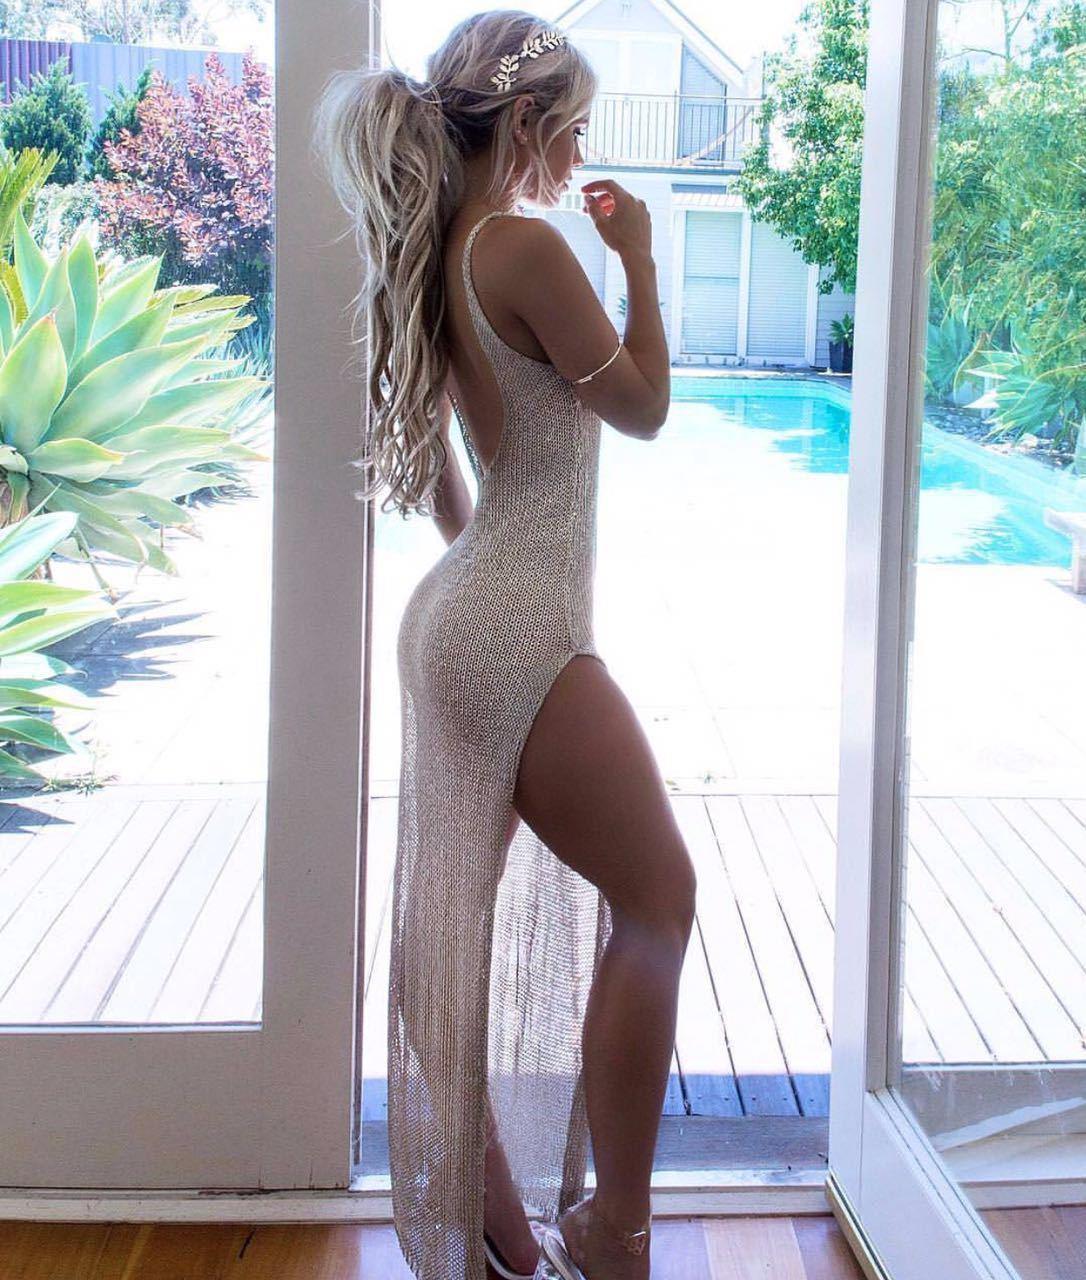 Nieuwe Hot Sale Zomer Mesh Sheer Lange Cover-Ups Vrouwen Badpak Bikini Cover Up Beach Jurk Badmode Badpak jurk